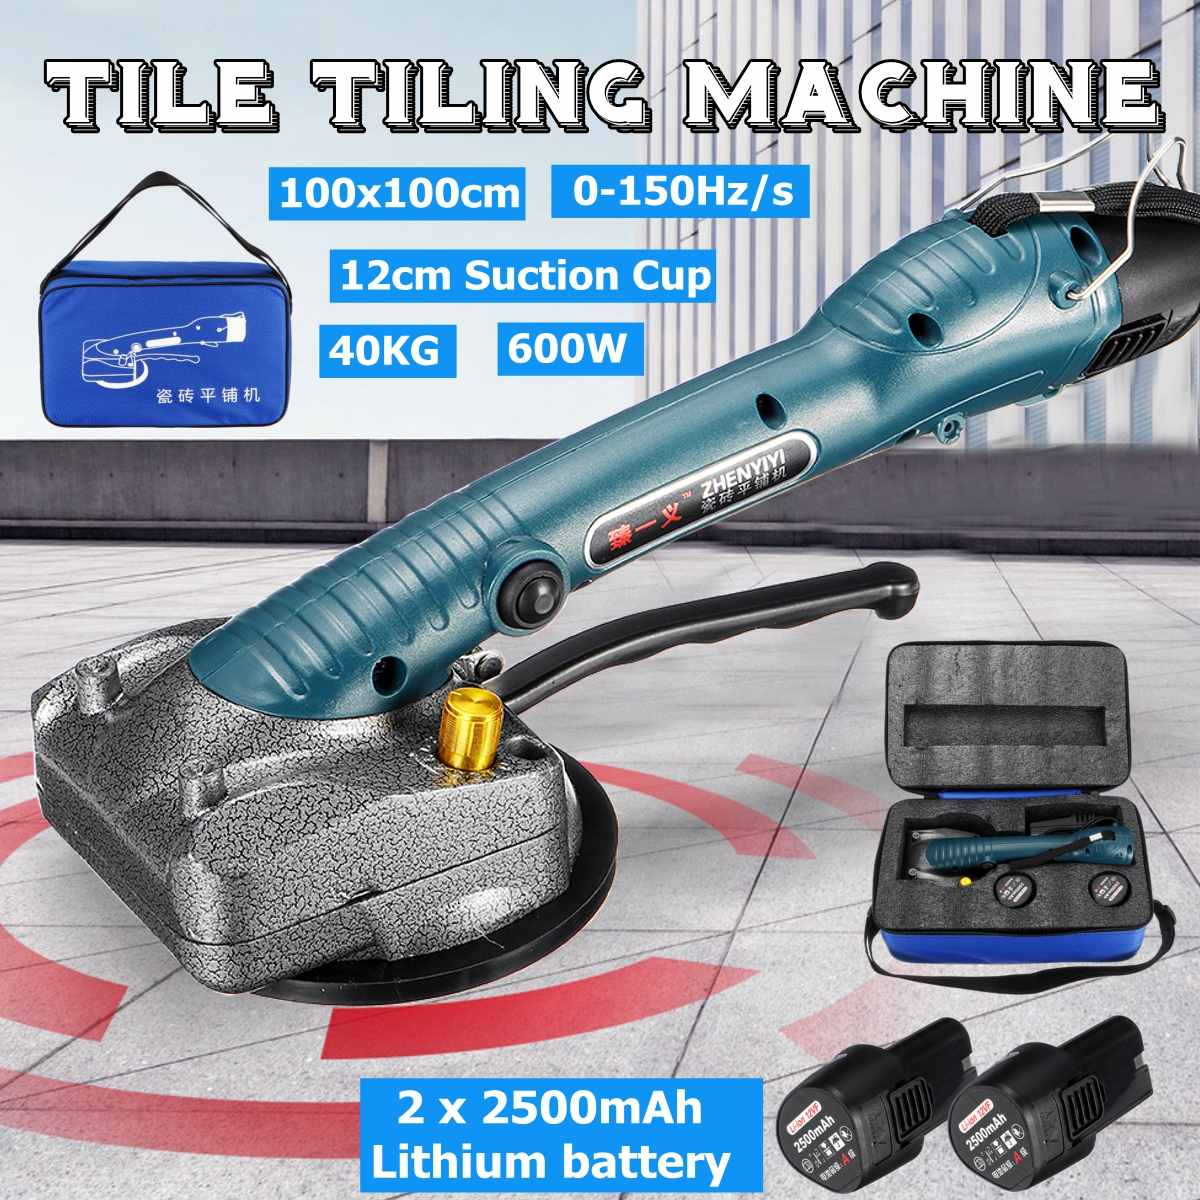 600W Tile Machine Vibrators…